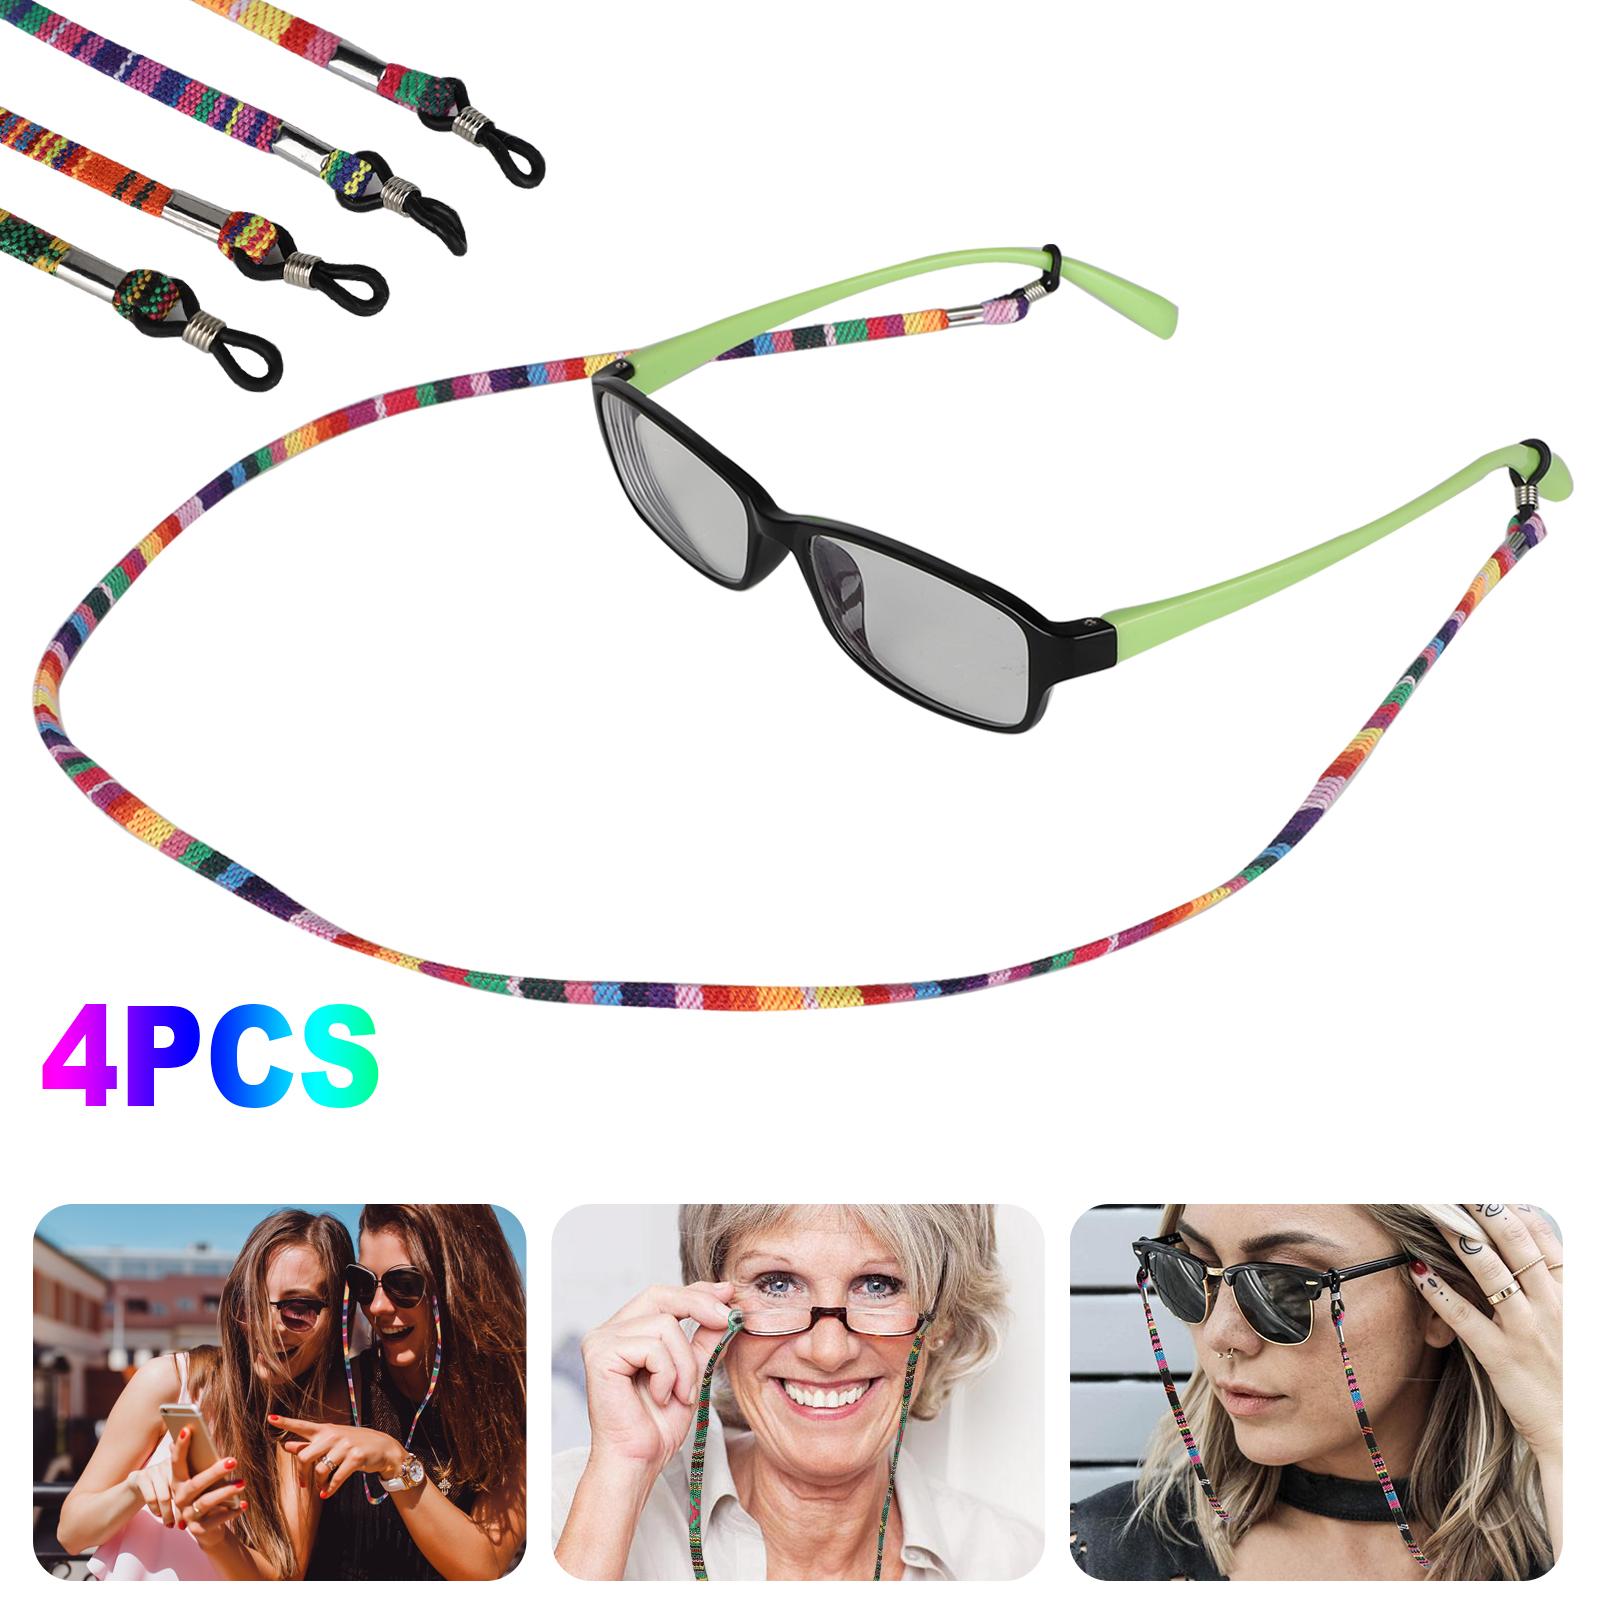 8 Pack Kids Silicone Anti-Slip Glasses Eyeglass Strap